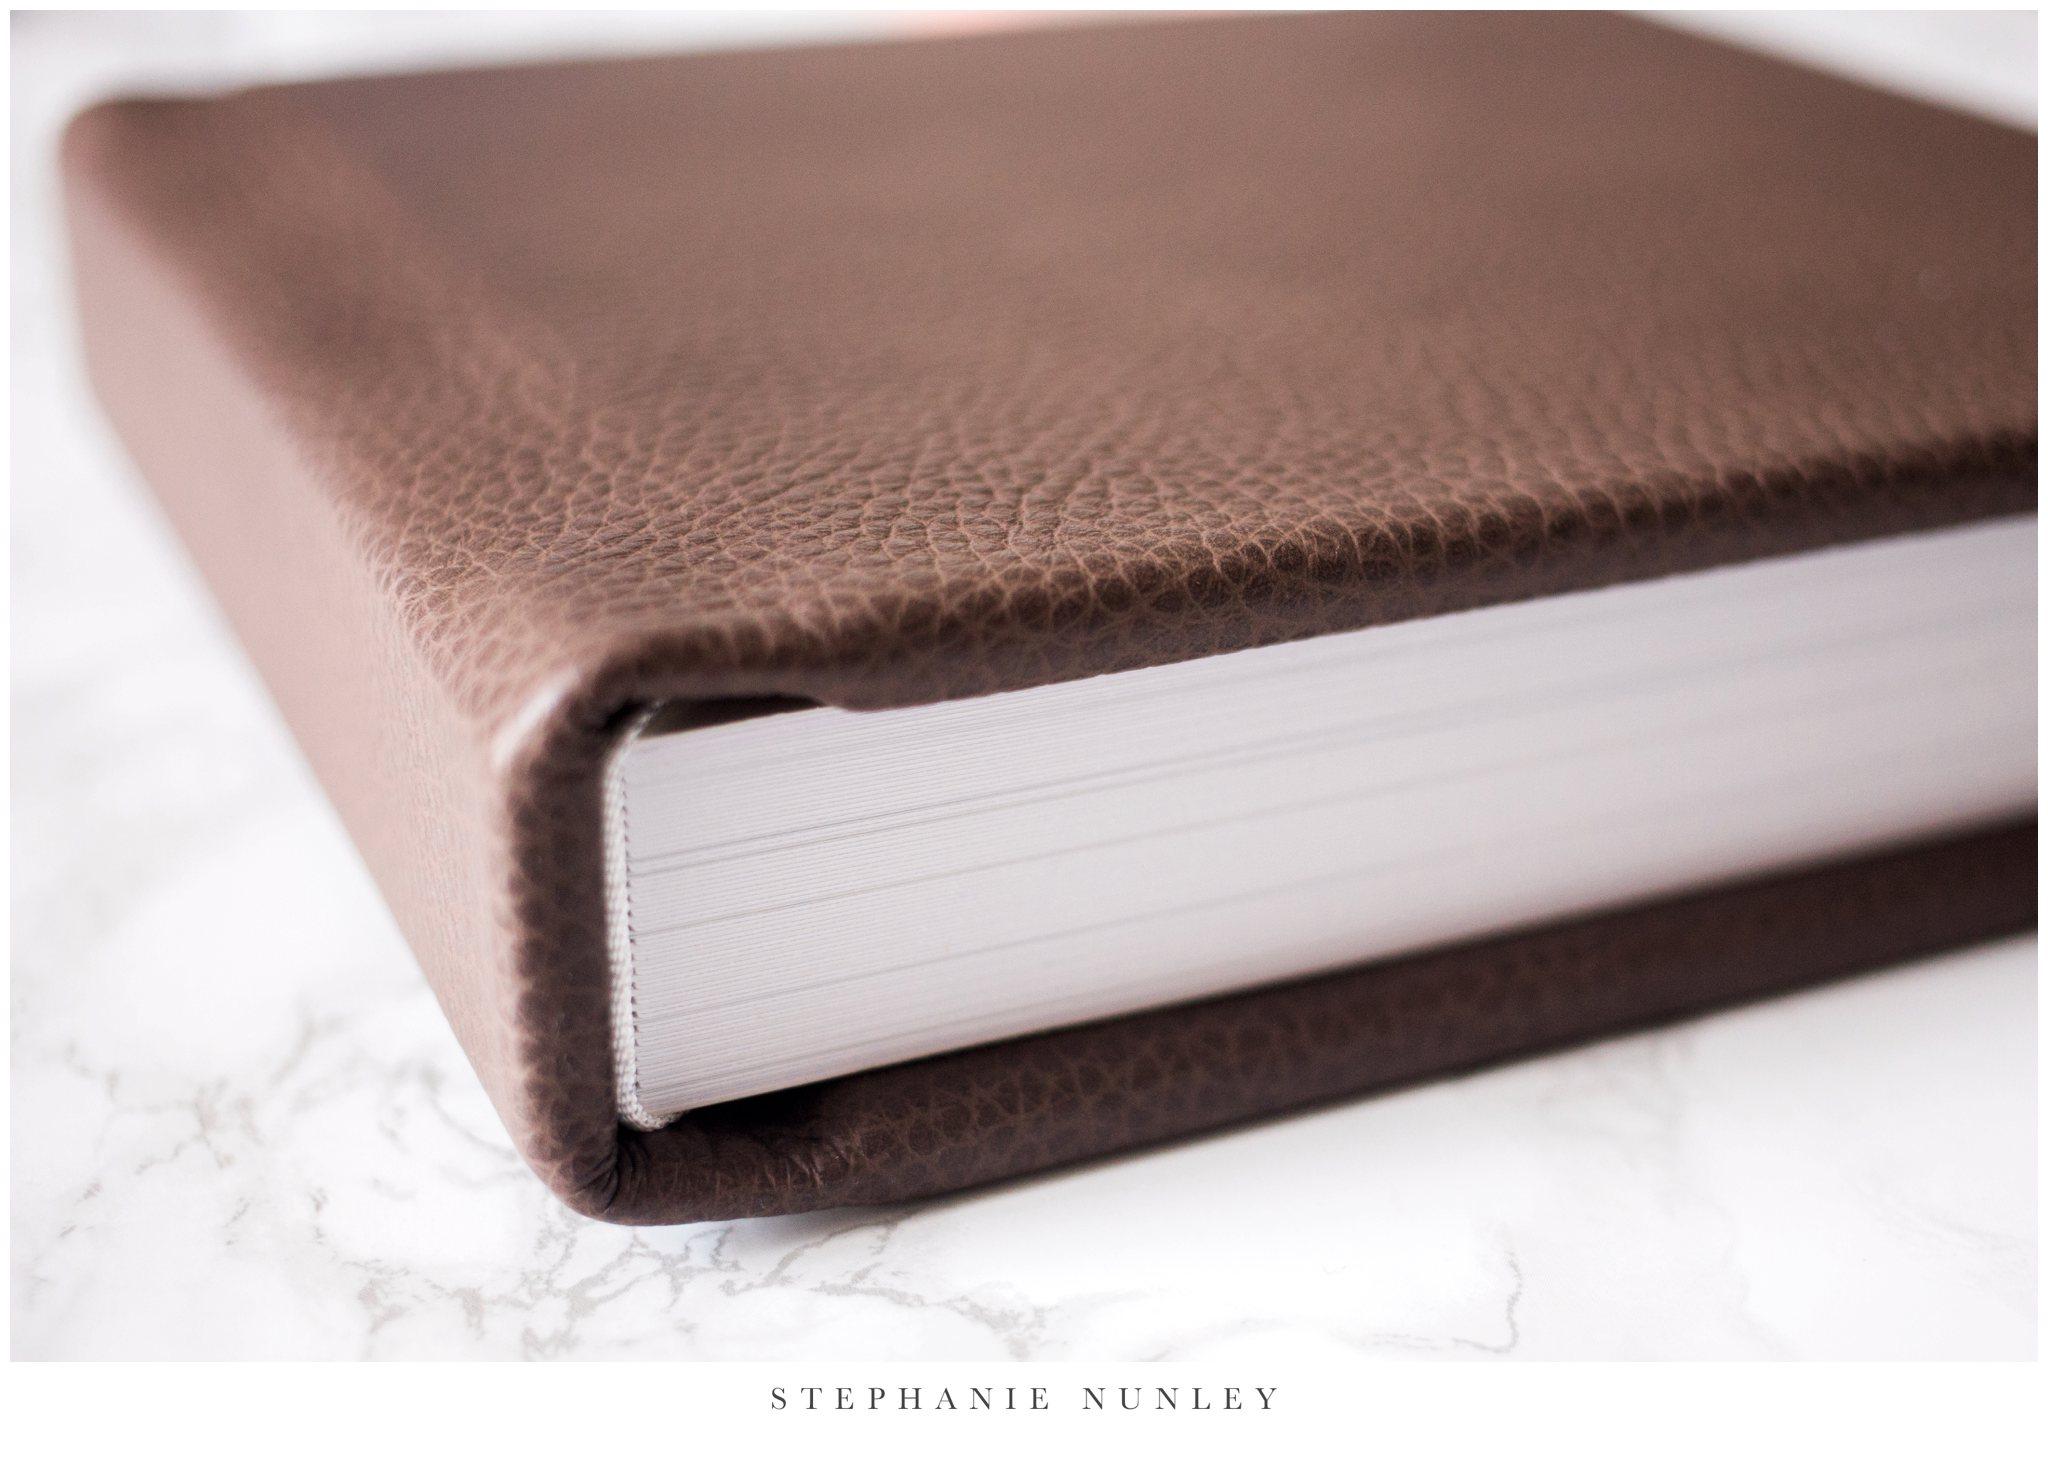 heirloom-leather-wedding-album-0001.jpg